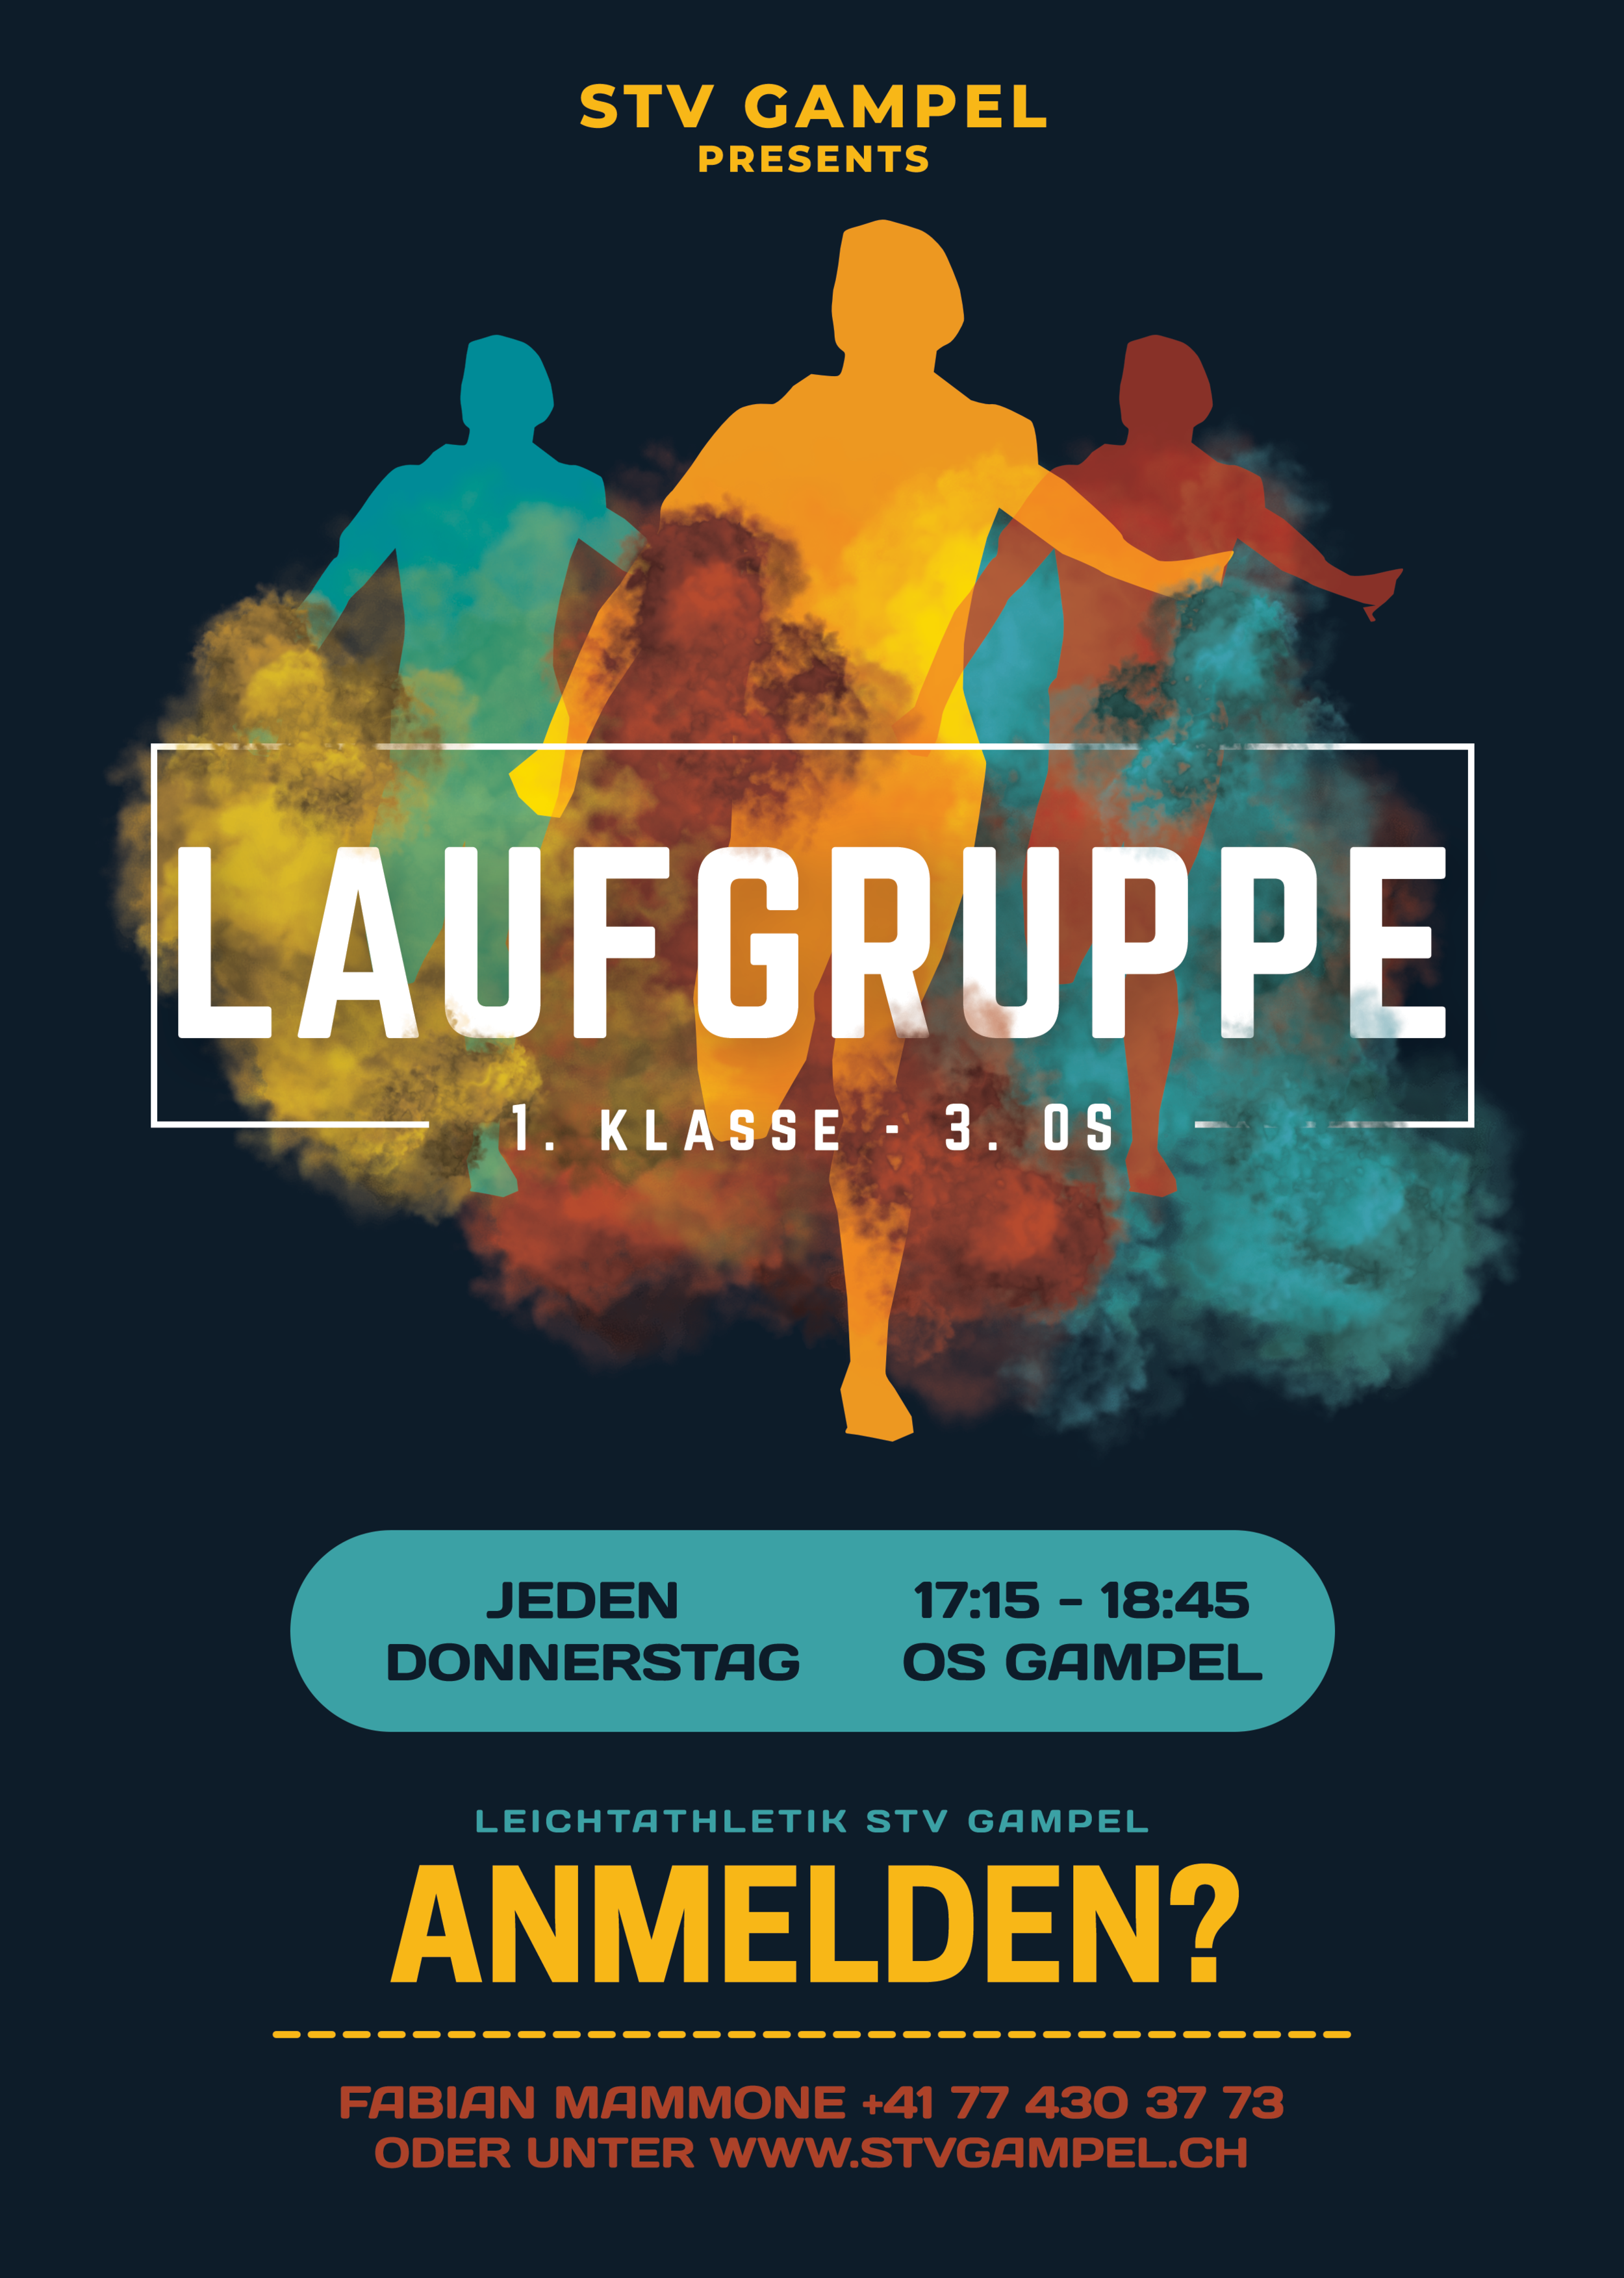 2019-01-13 Flyer Laufgruppe Leichtathletik.png